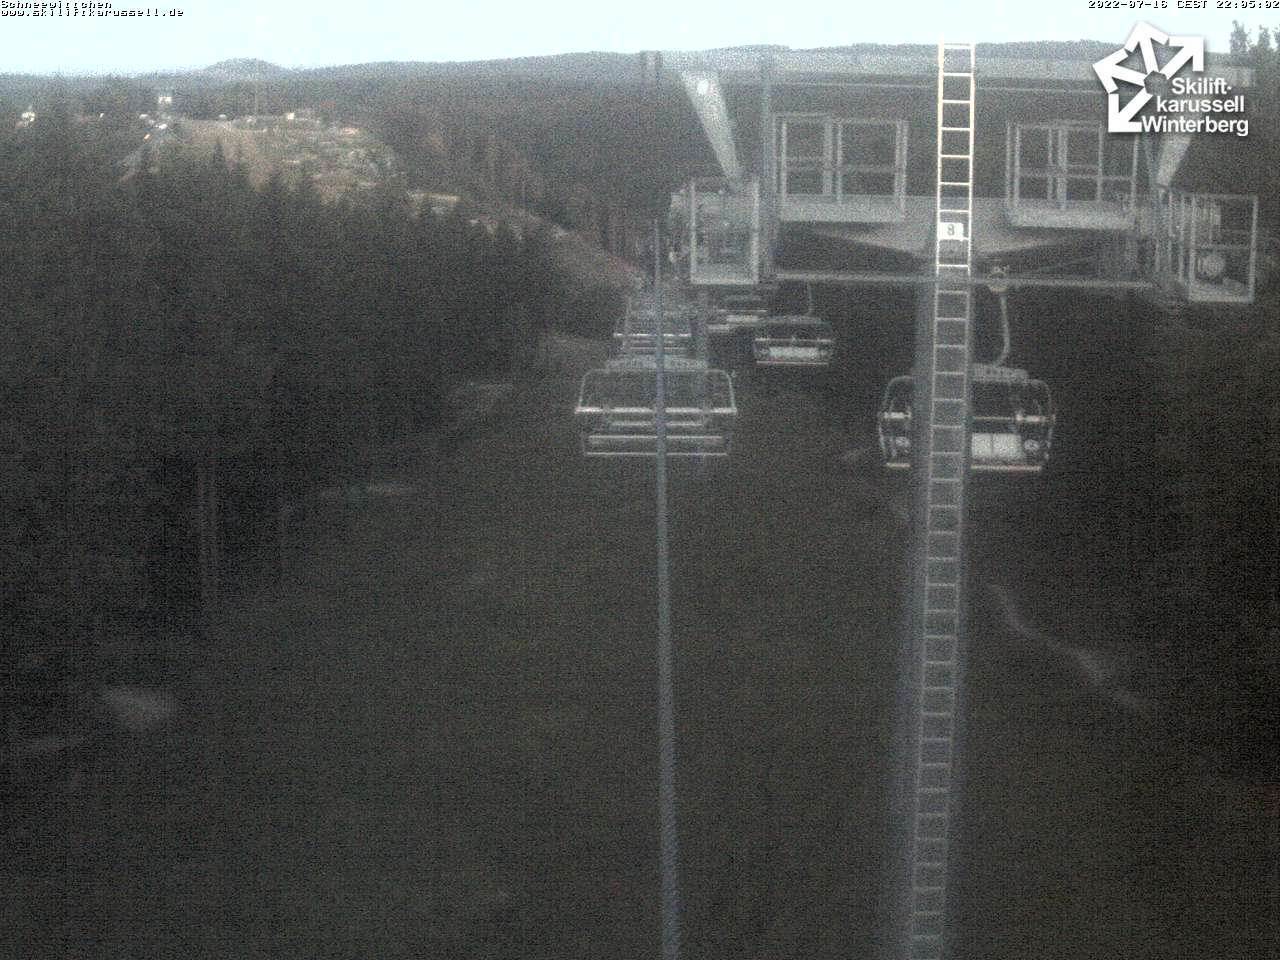 Winterberg Wetter Webcam